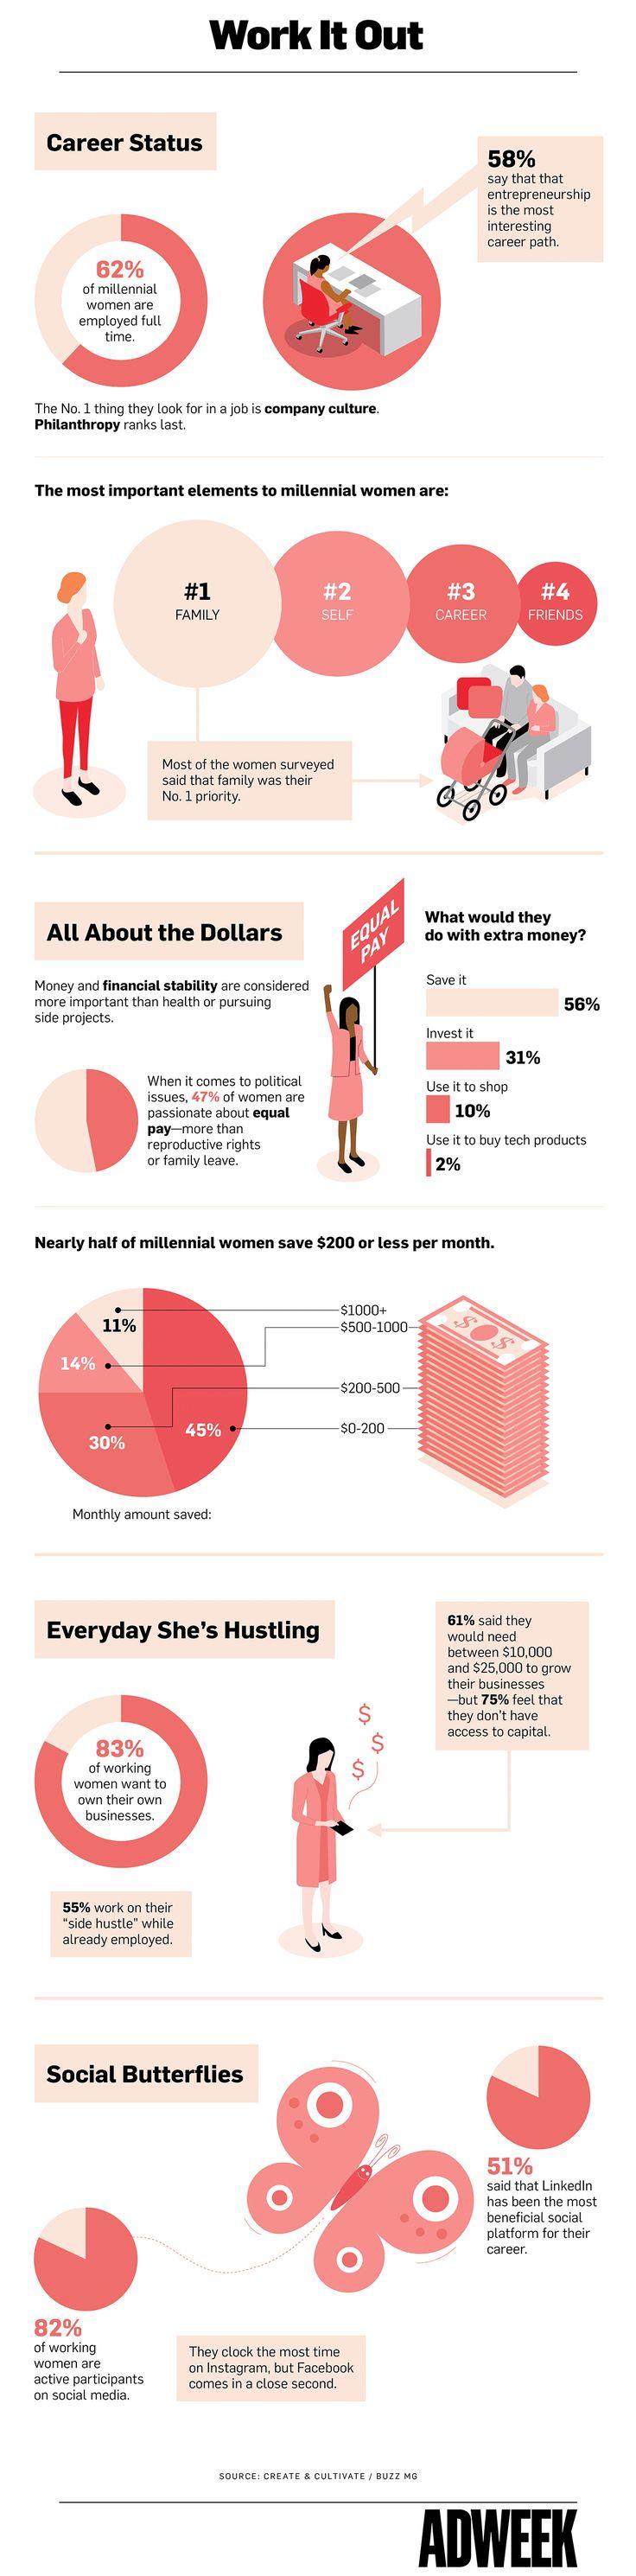 Mejores 164 imágenes de Marketing Charts en Pinterest | Diseño de ...